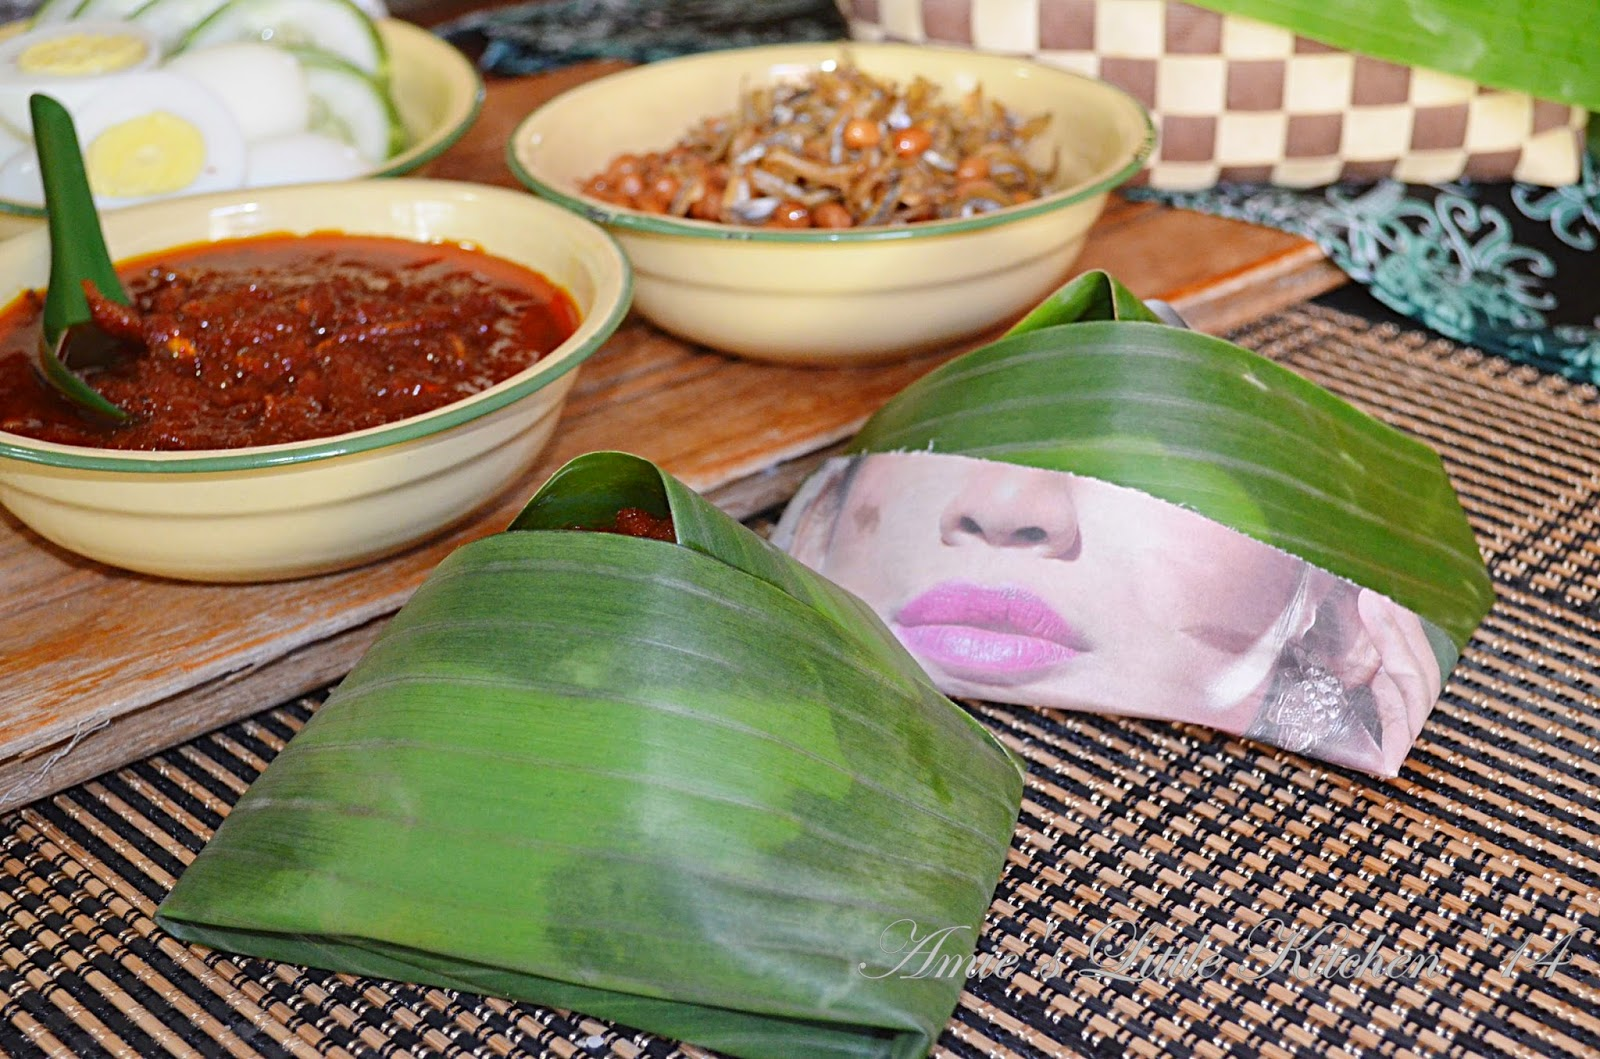 Nasi Lemak Bungkus Becomes Fashionable Handbag Created by ...